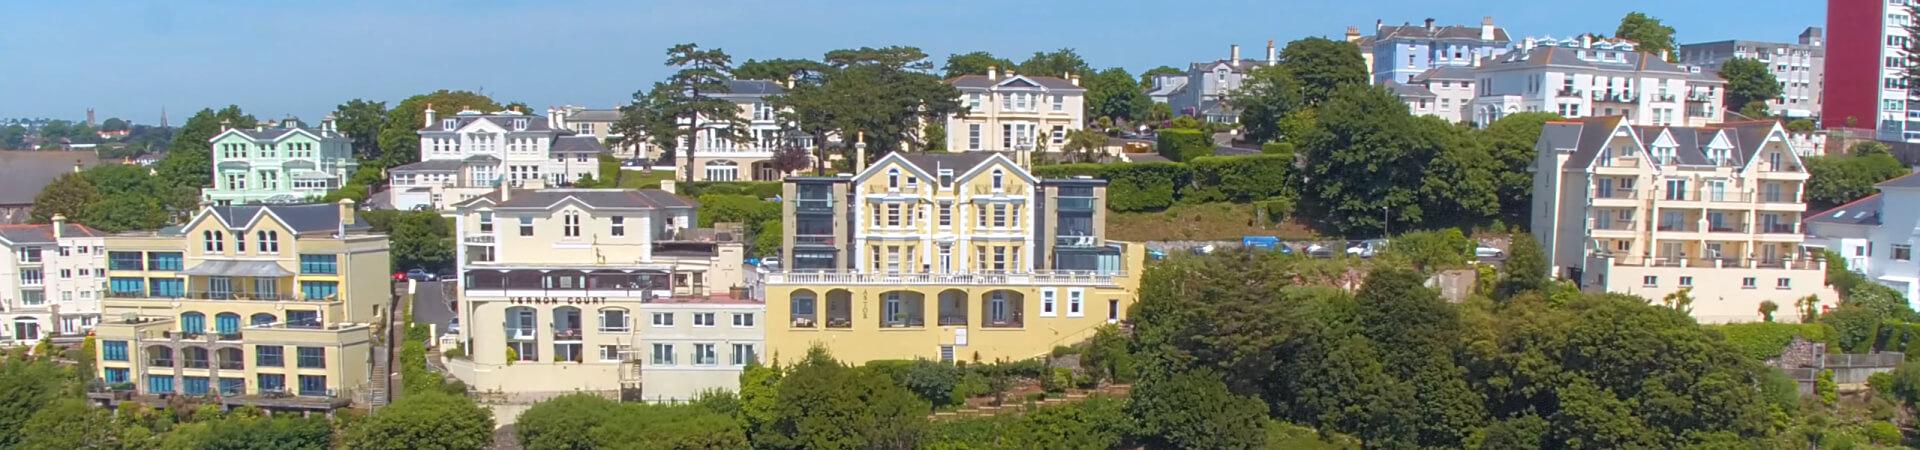 Seaside apartments in Torquay